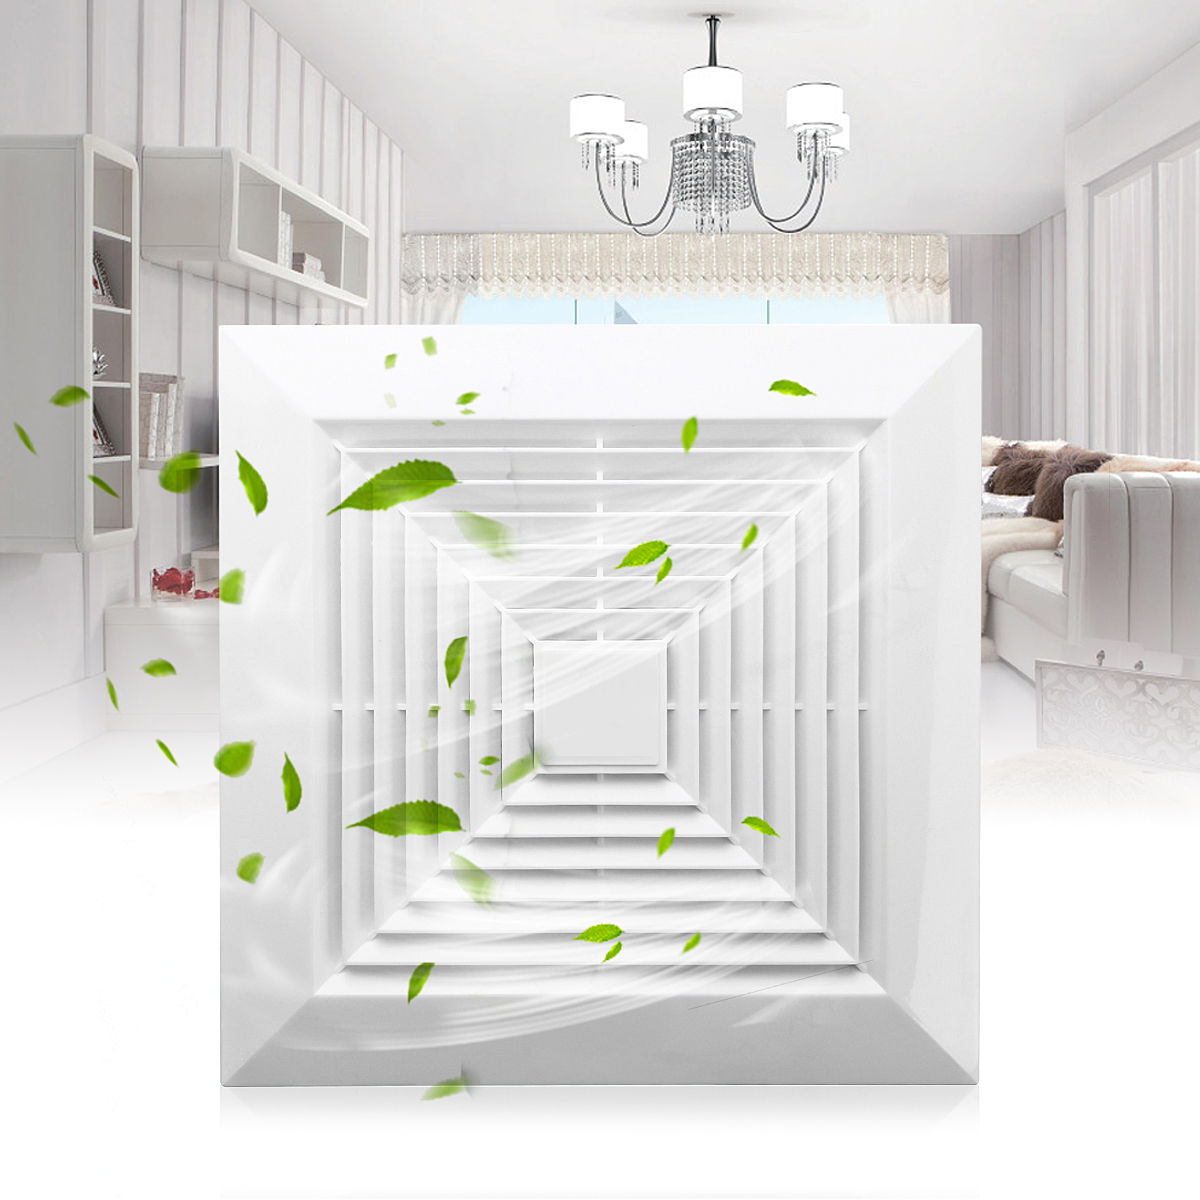 31w 6 inch 220v low noise window ceiling wall mount - Wall mounted exhaust fan for bathroom ...